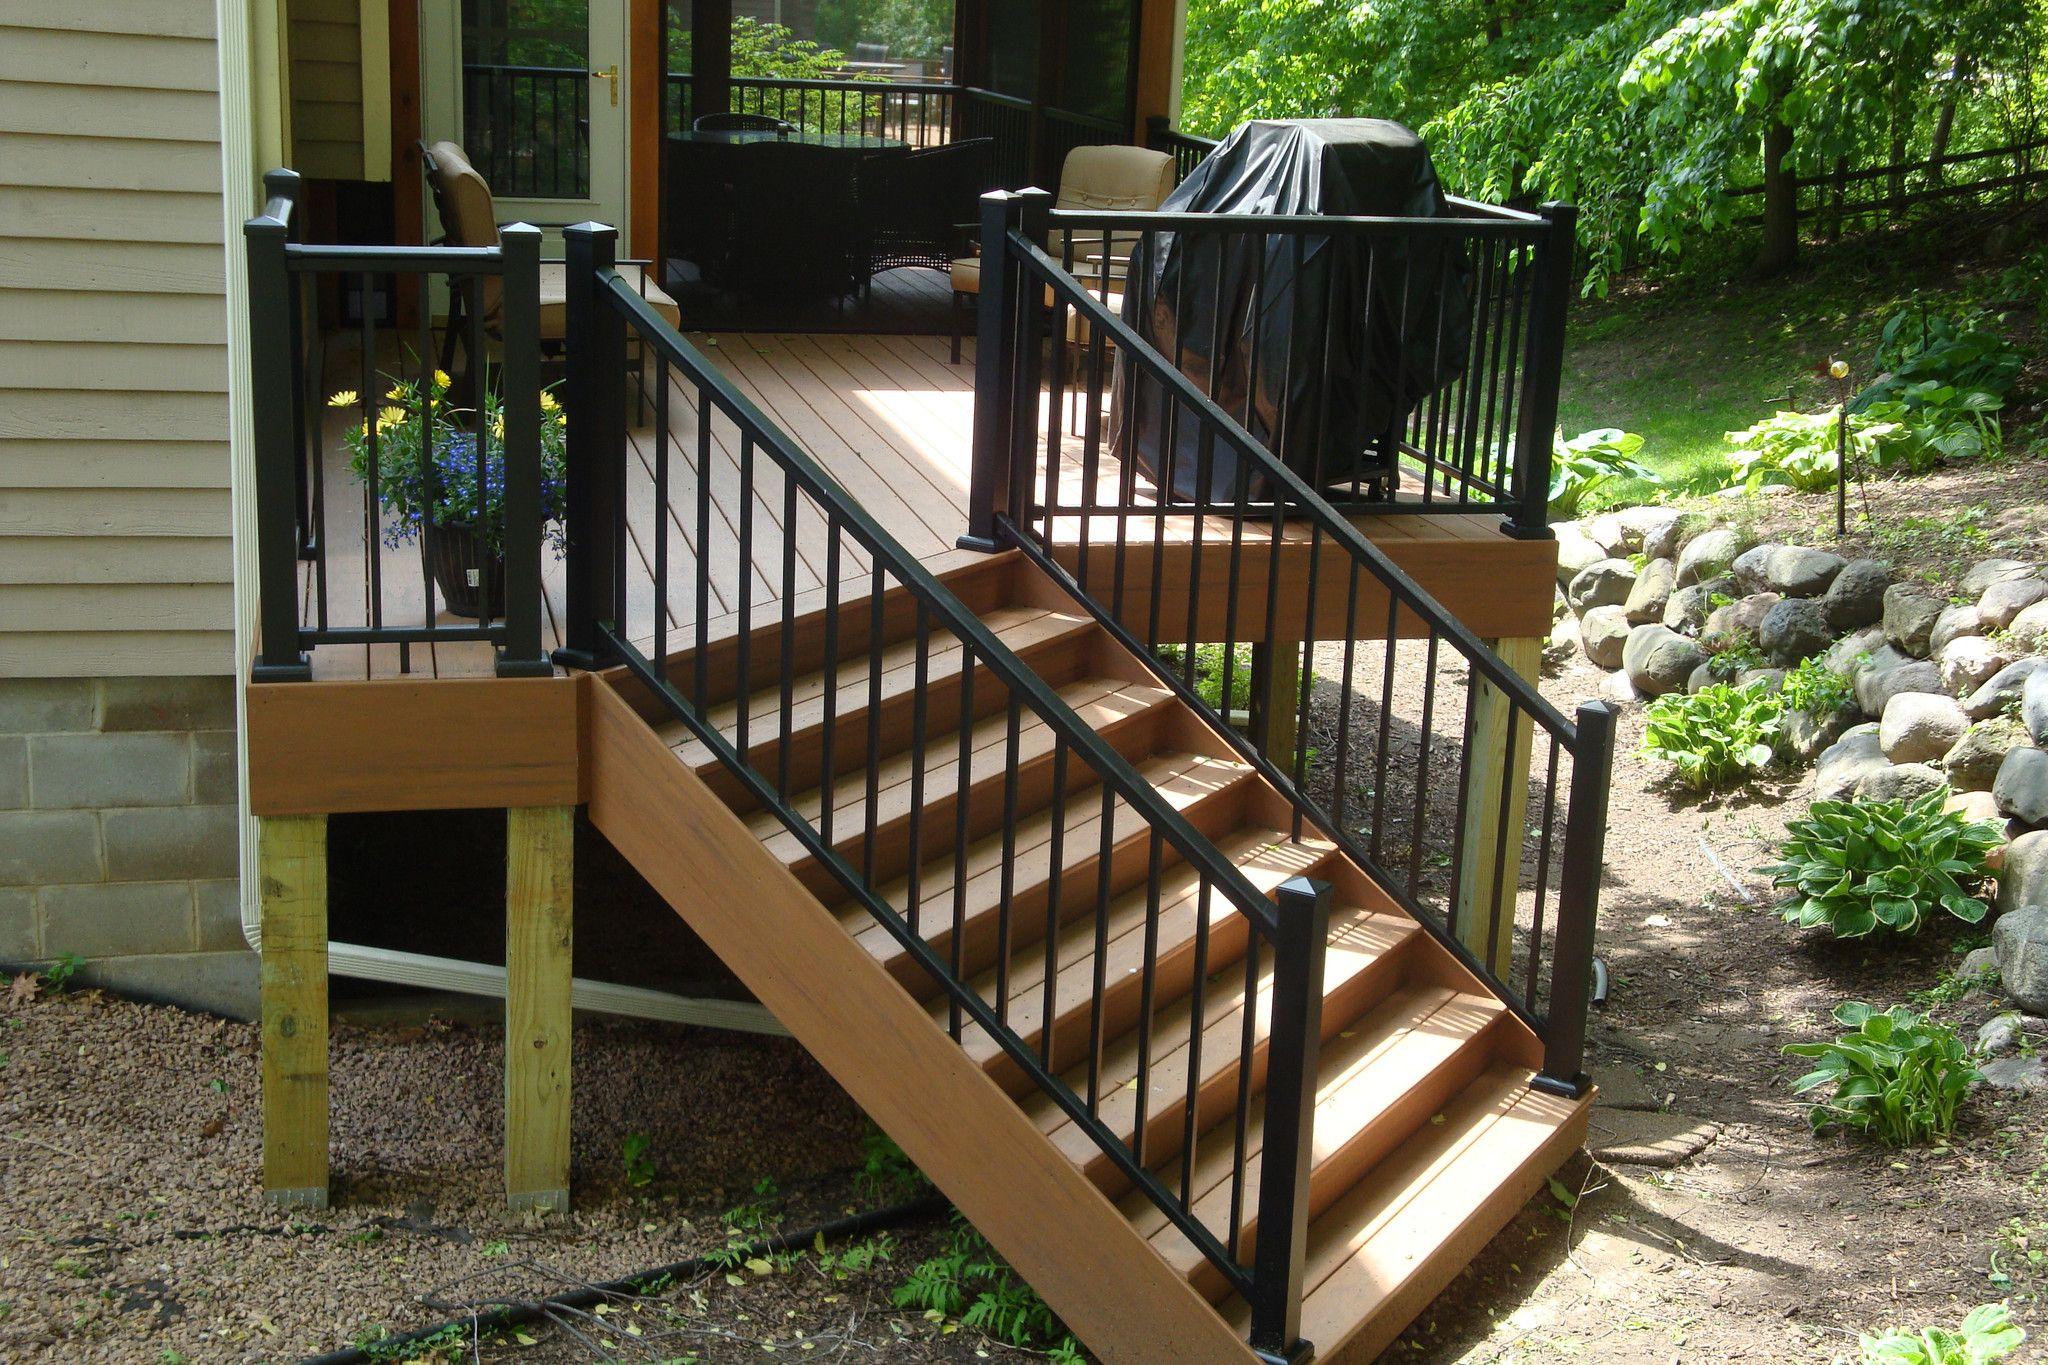 Aluminum Railing Kit Series 100 Adjustable Stair Rail Exterior Stair Railing Exterior Stairs Outdoor Stair Railing